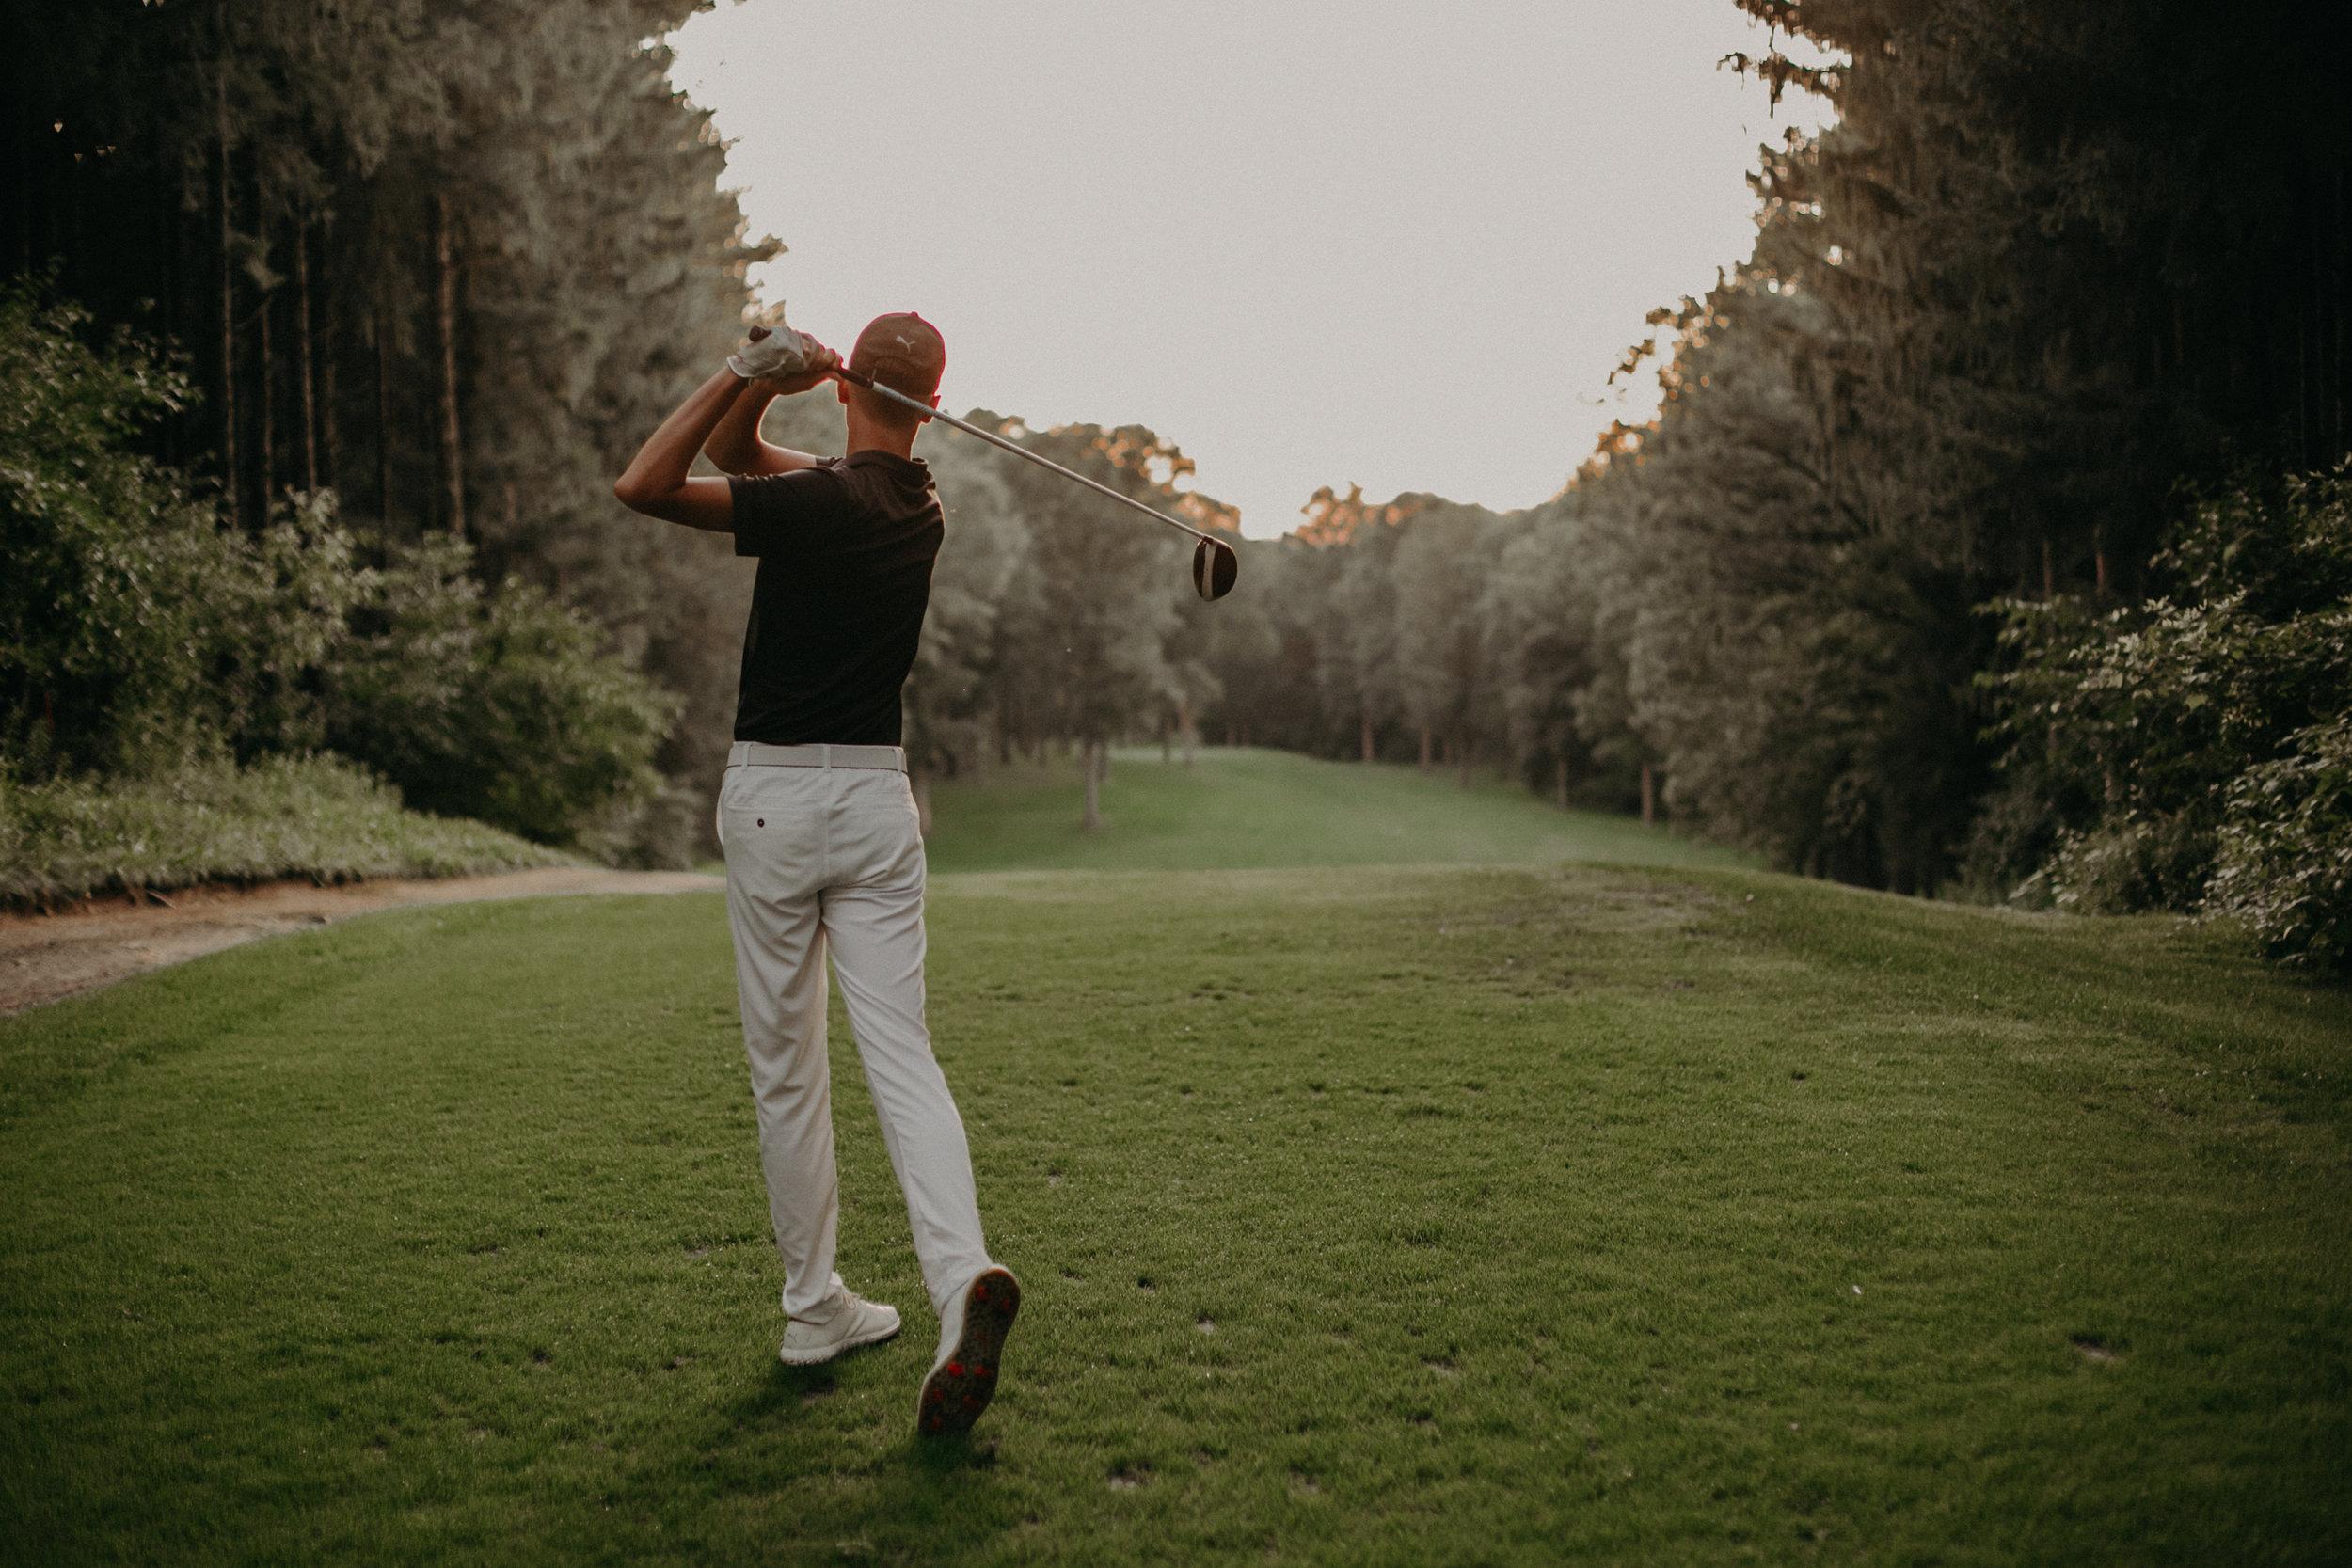 amazing senior photos of guy golfing at Wisconsin Golf course